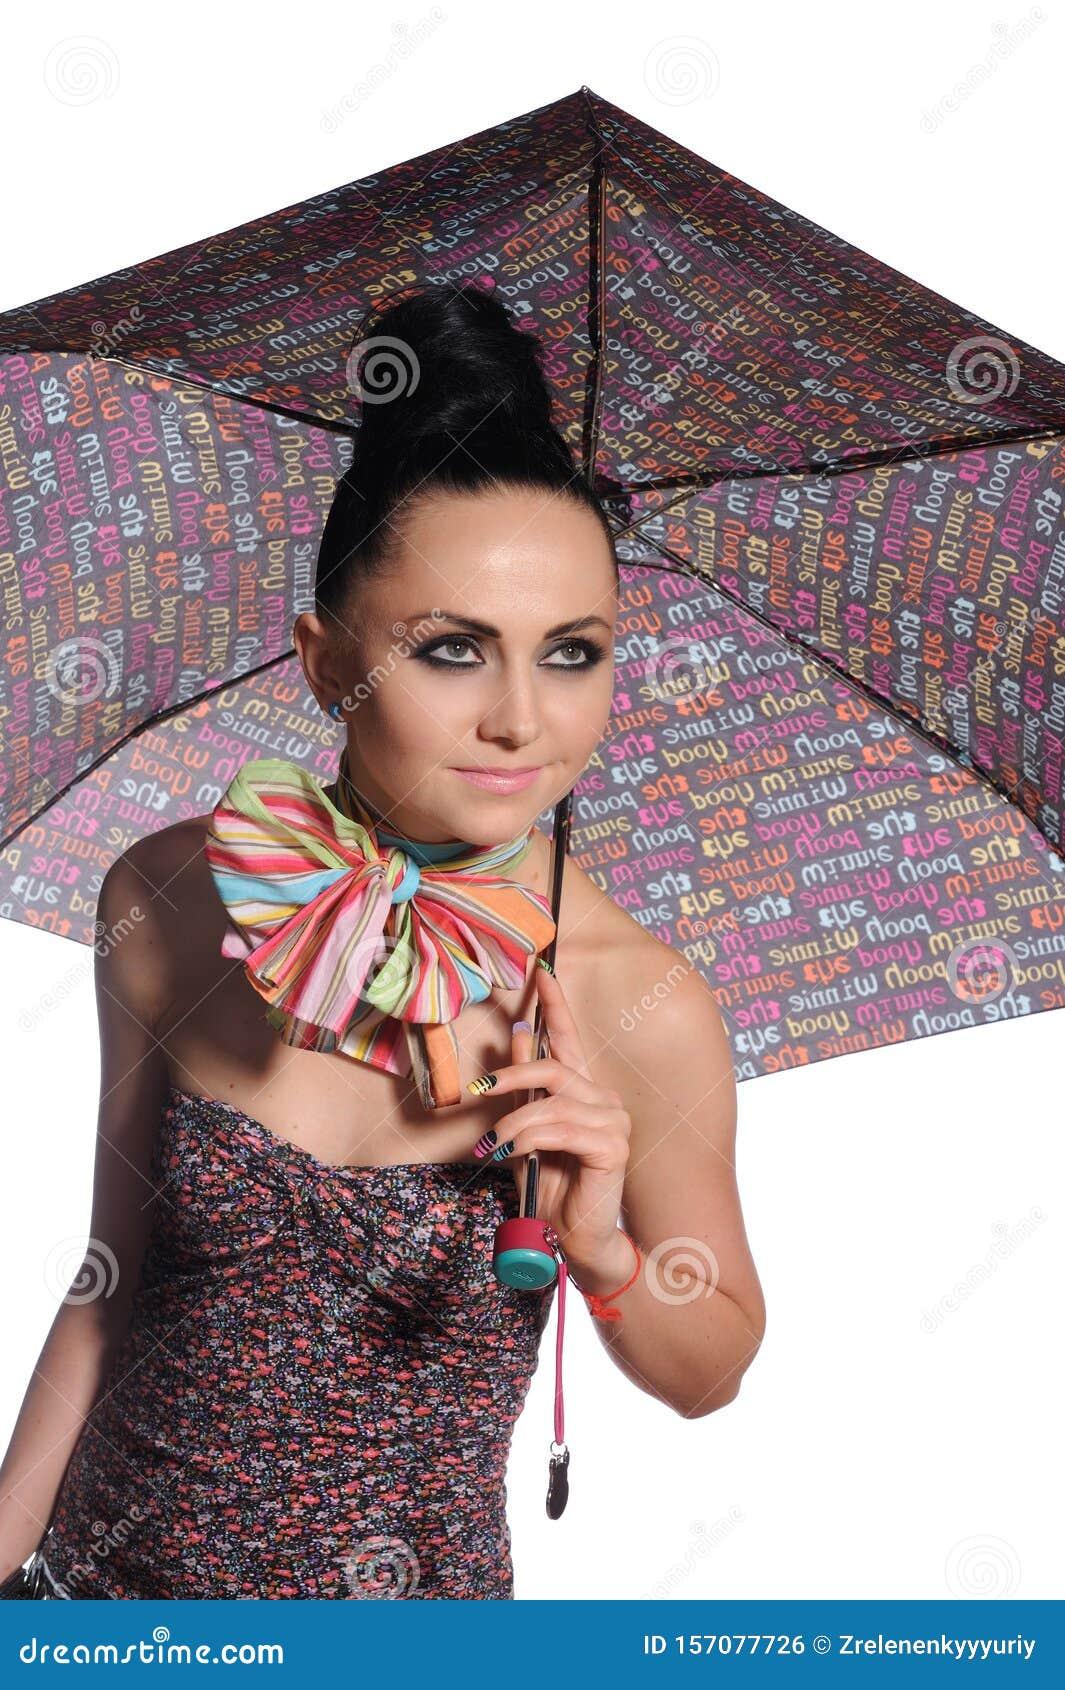 Turkish Actress Hd Wallpapers,Turkish Actress Pictures,Hot